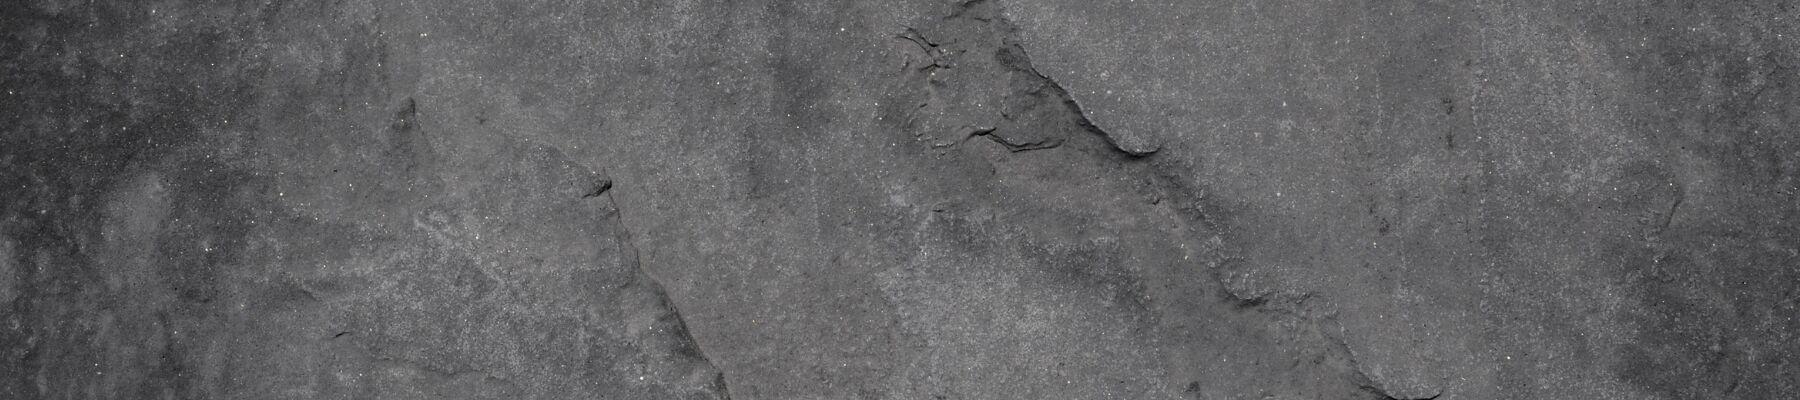 up close rock background grey